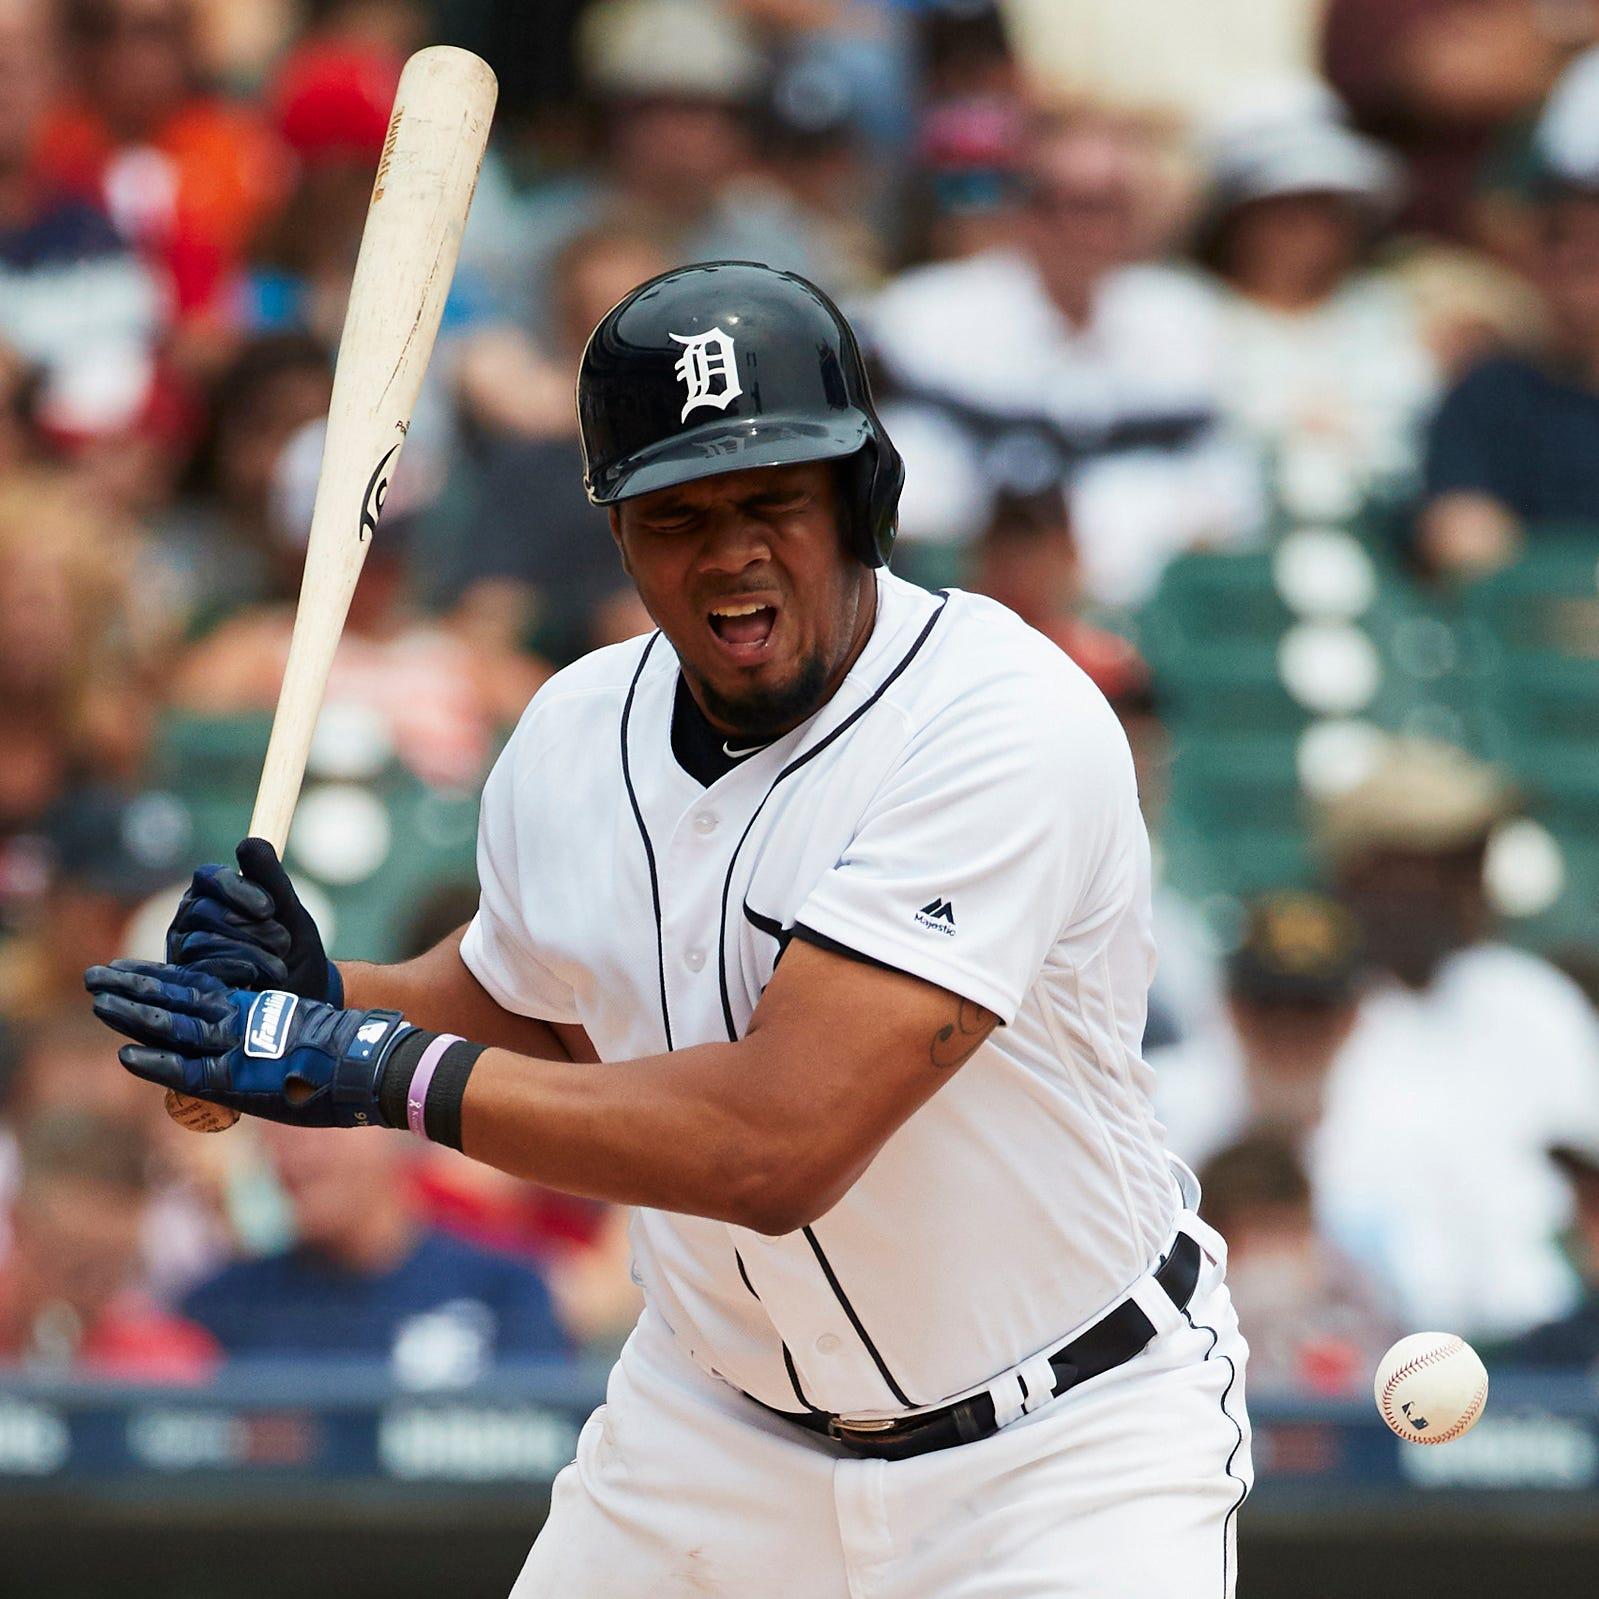 Detroit Tigers vs. Chicago White Sox series